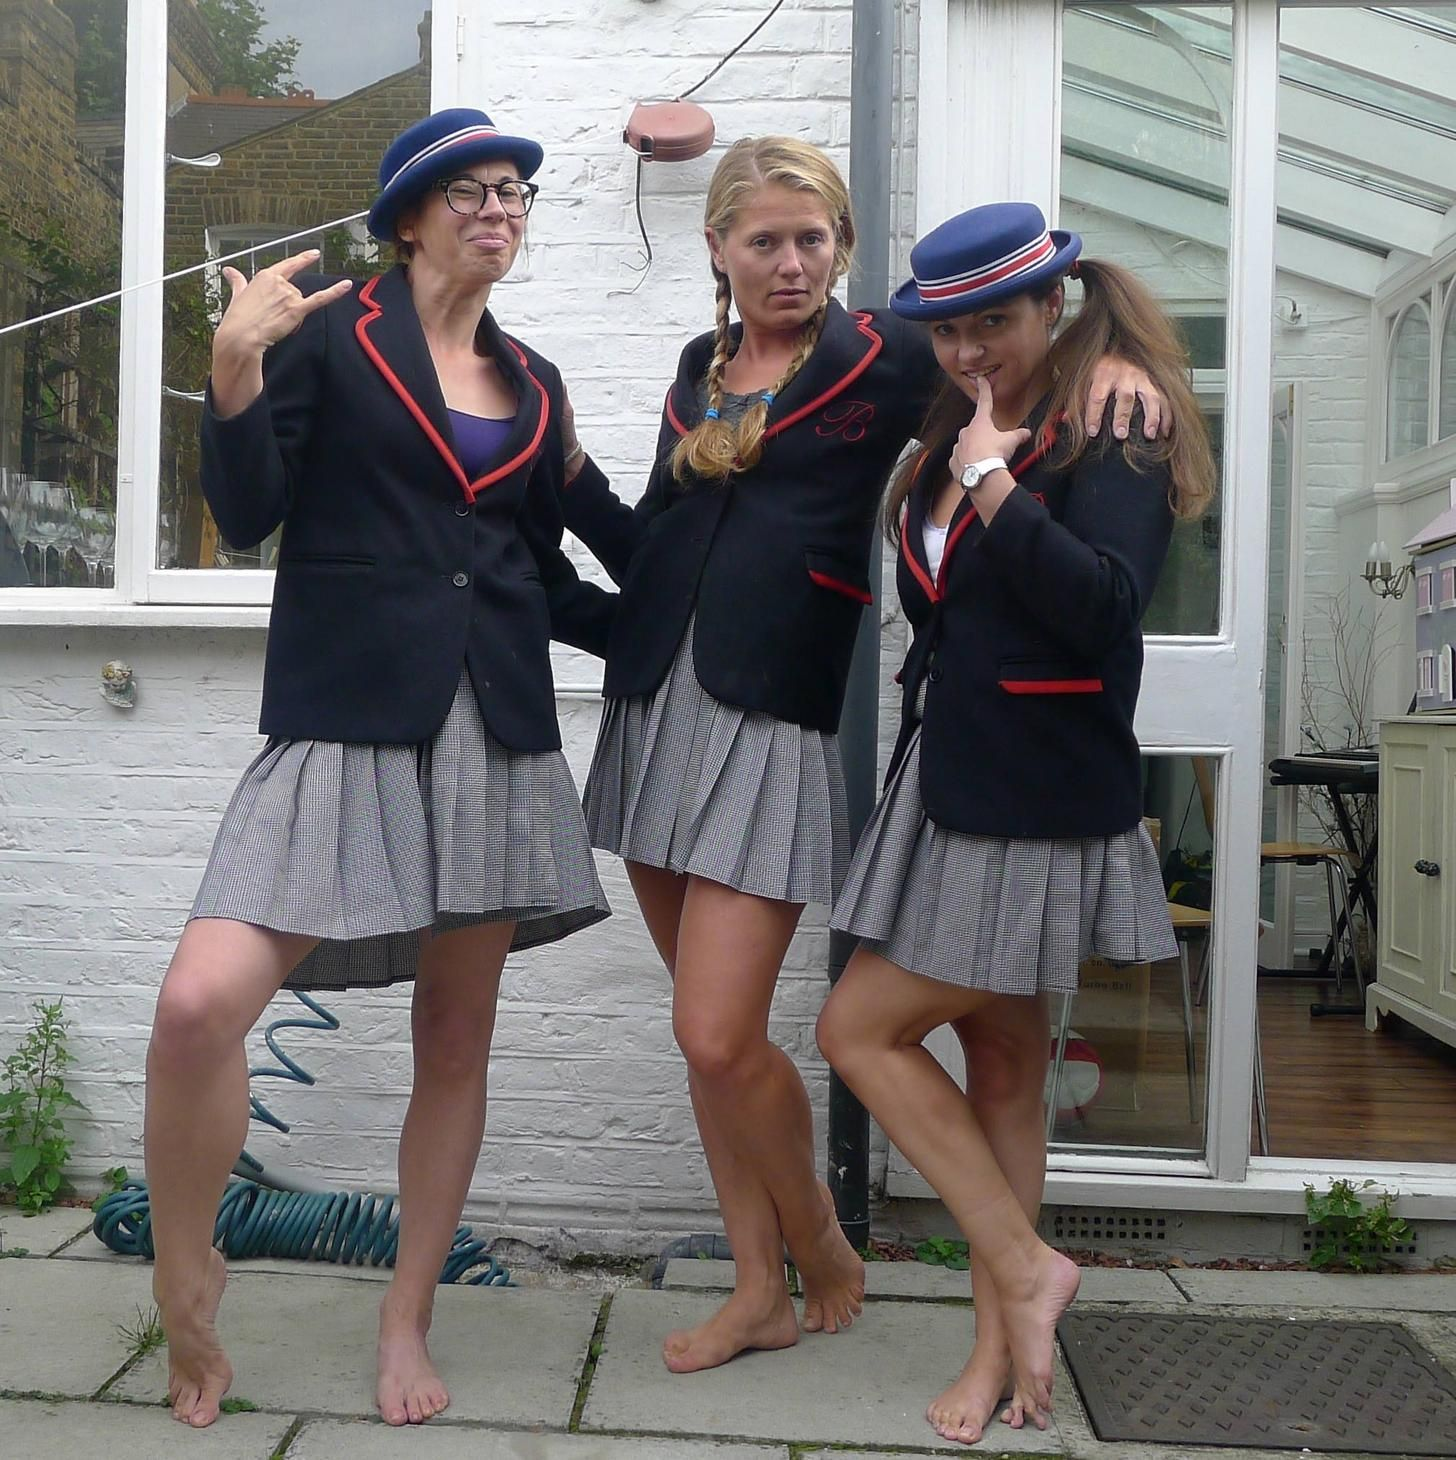 Playing Schoolgirls Barefoot Feels Good